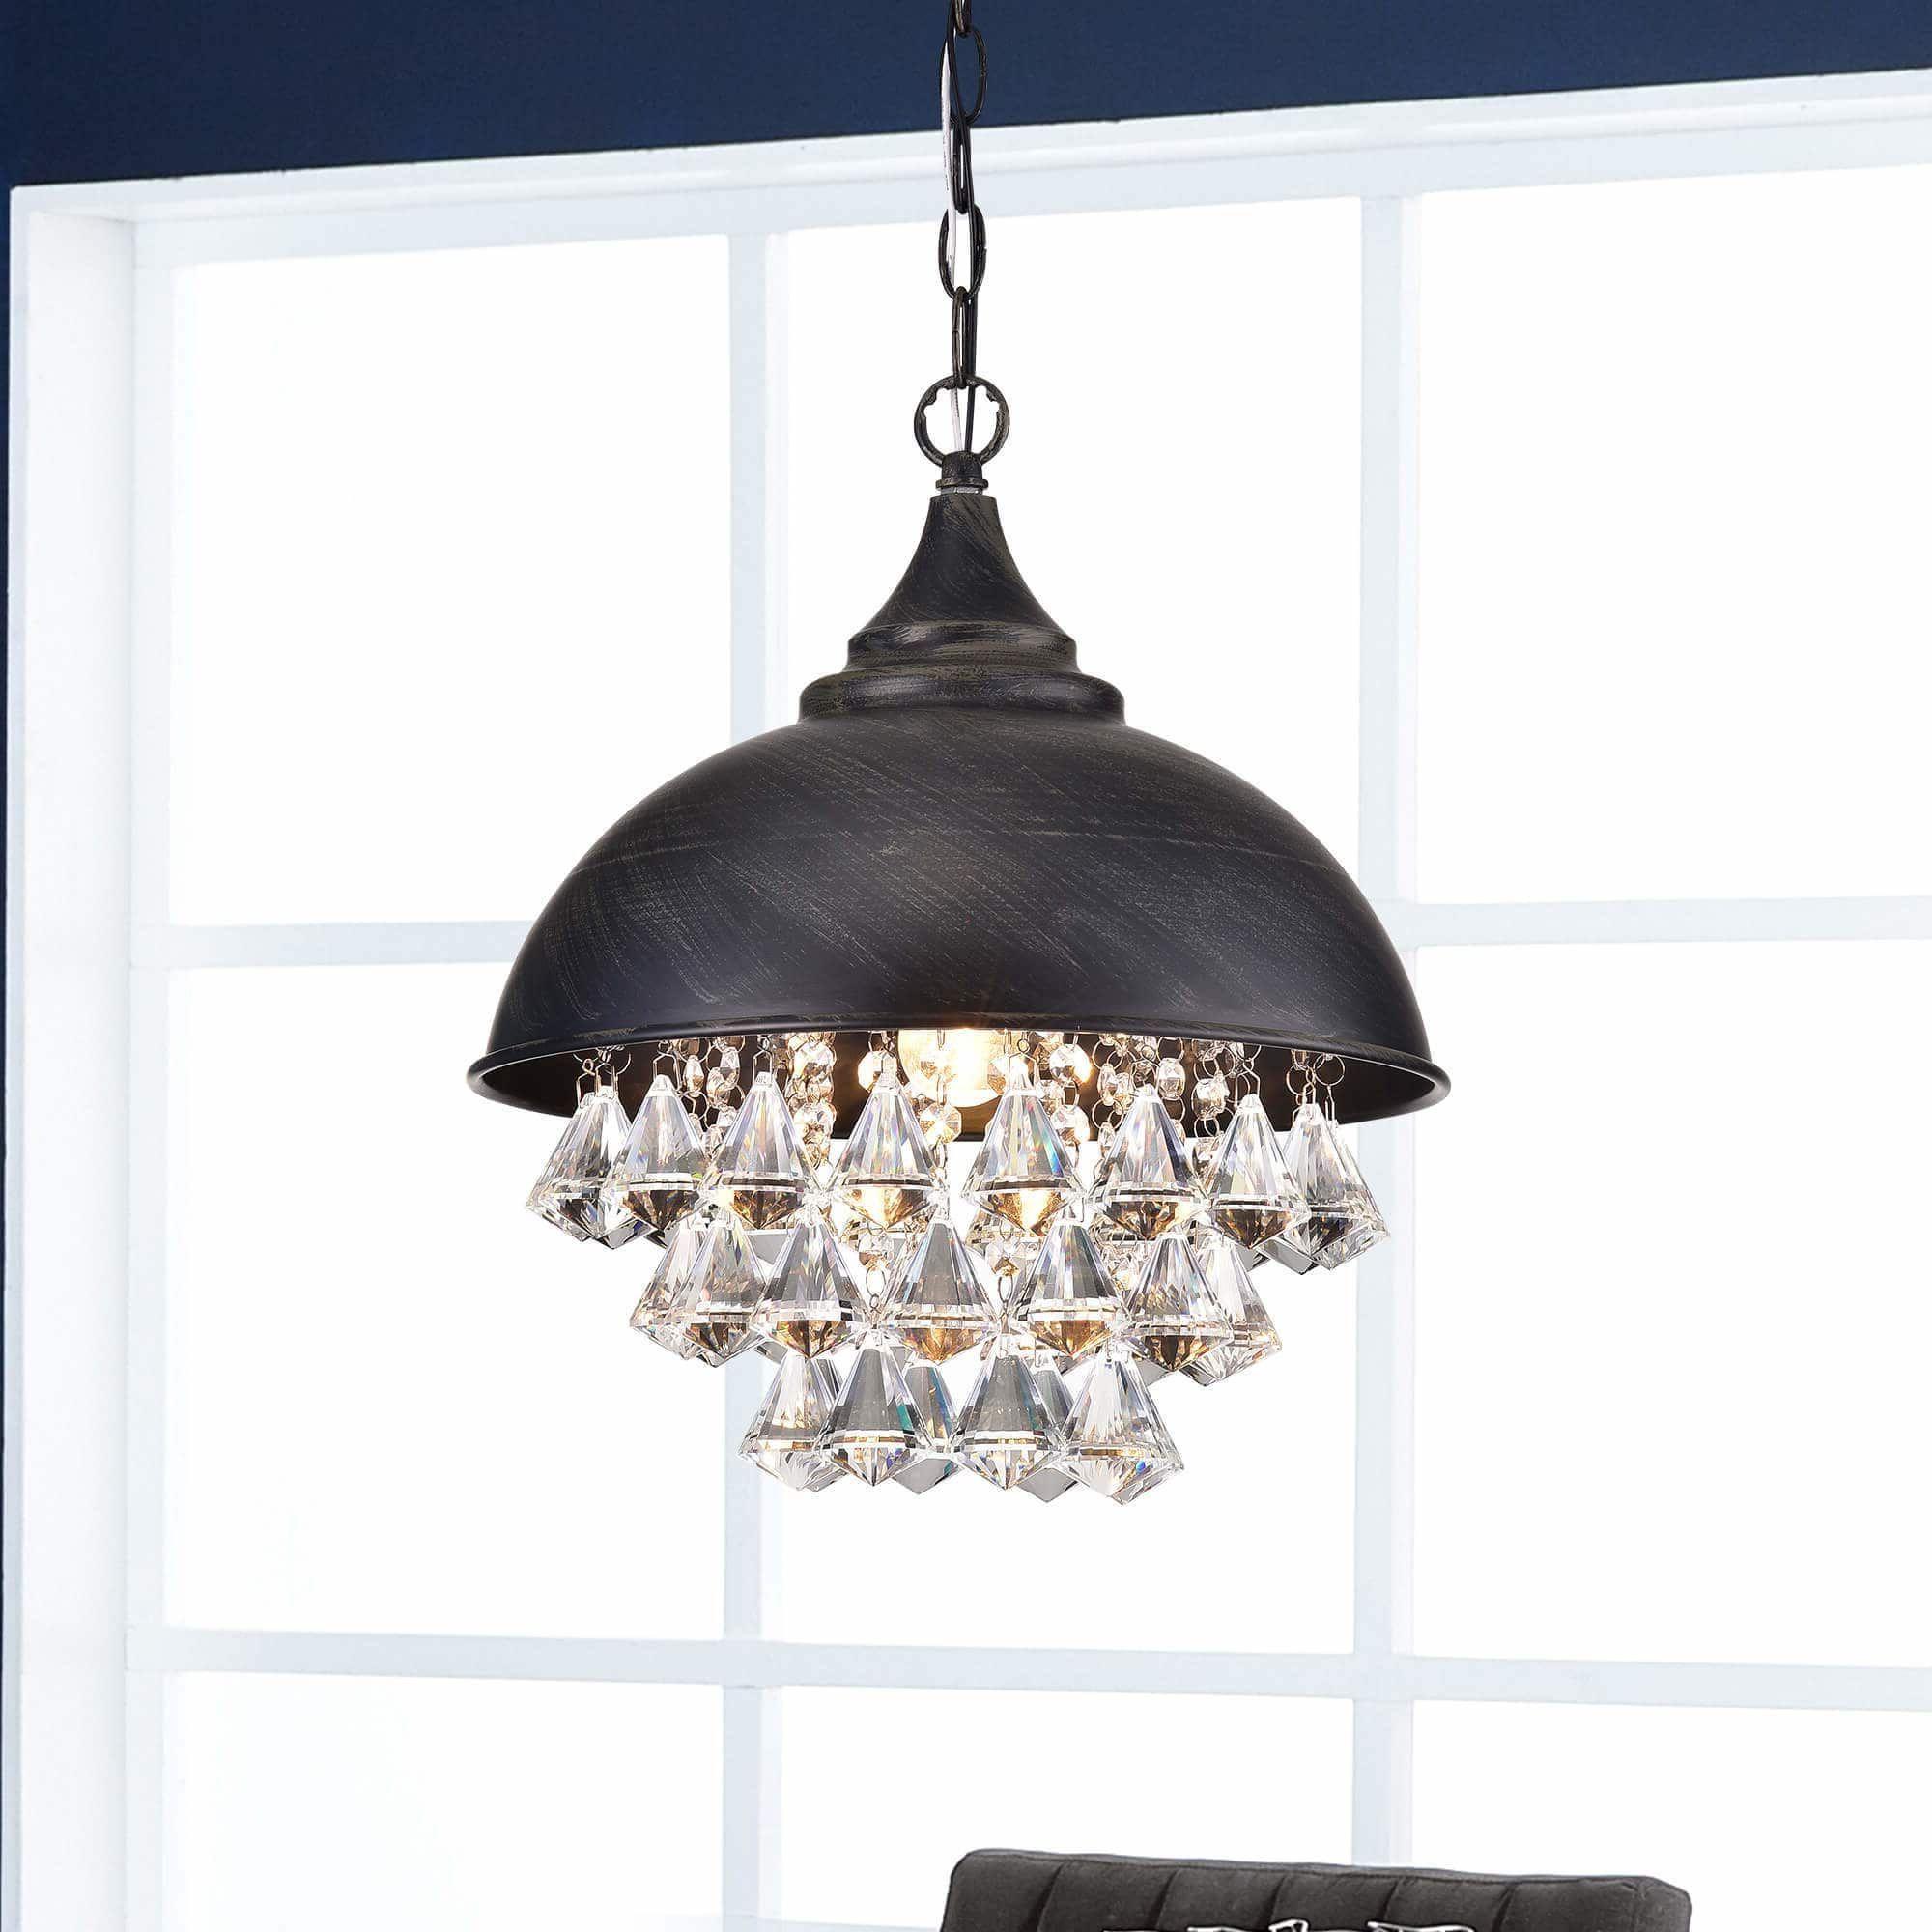 Best and Newest Visalia Antique Black Single Light Crystal Chandelier intended for Monadnock 1-Light Single Dome Pendants